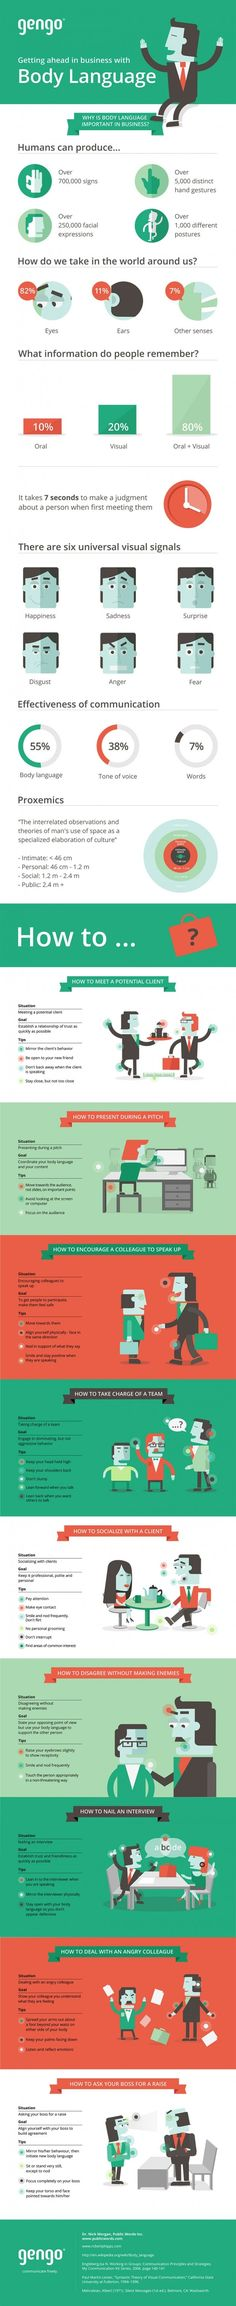 Gengo_body_language_ot #infographic #towergraphic #infografia